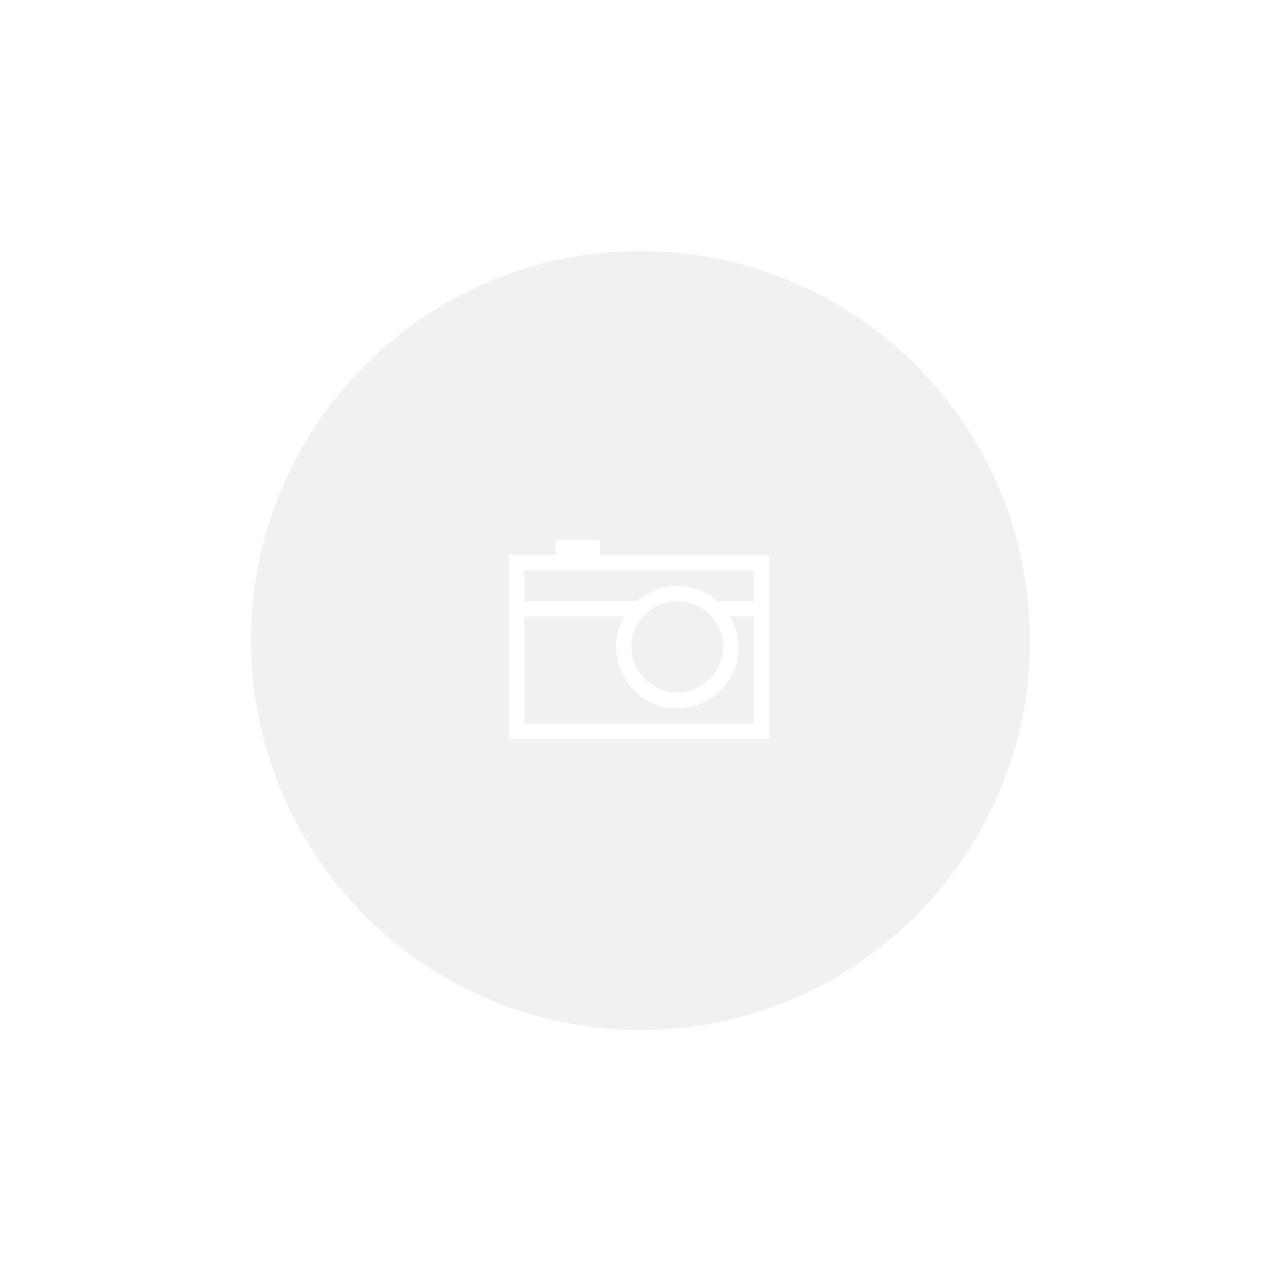 PLACA DE VIDEO SAPPHIRE RADEON RX 560 2GB GDDR5 128BITS, 11267-02-20G